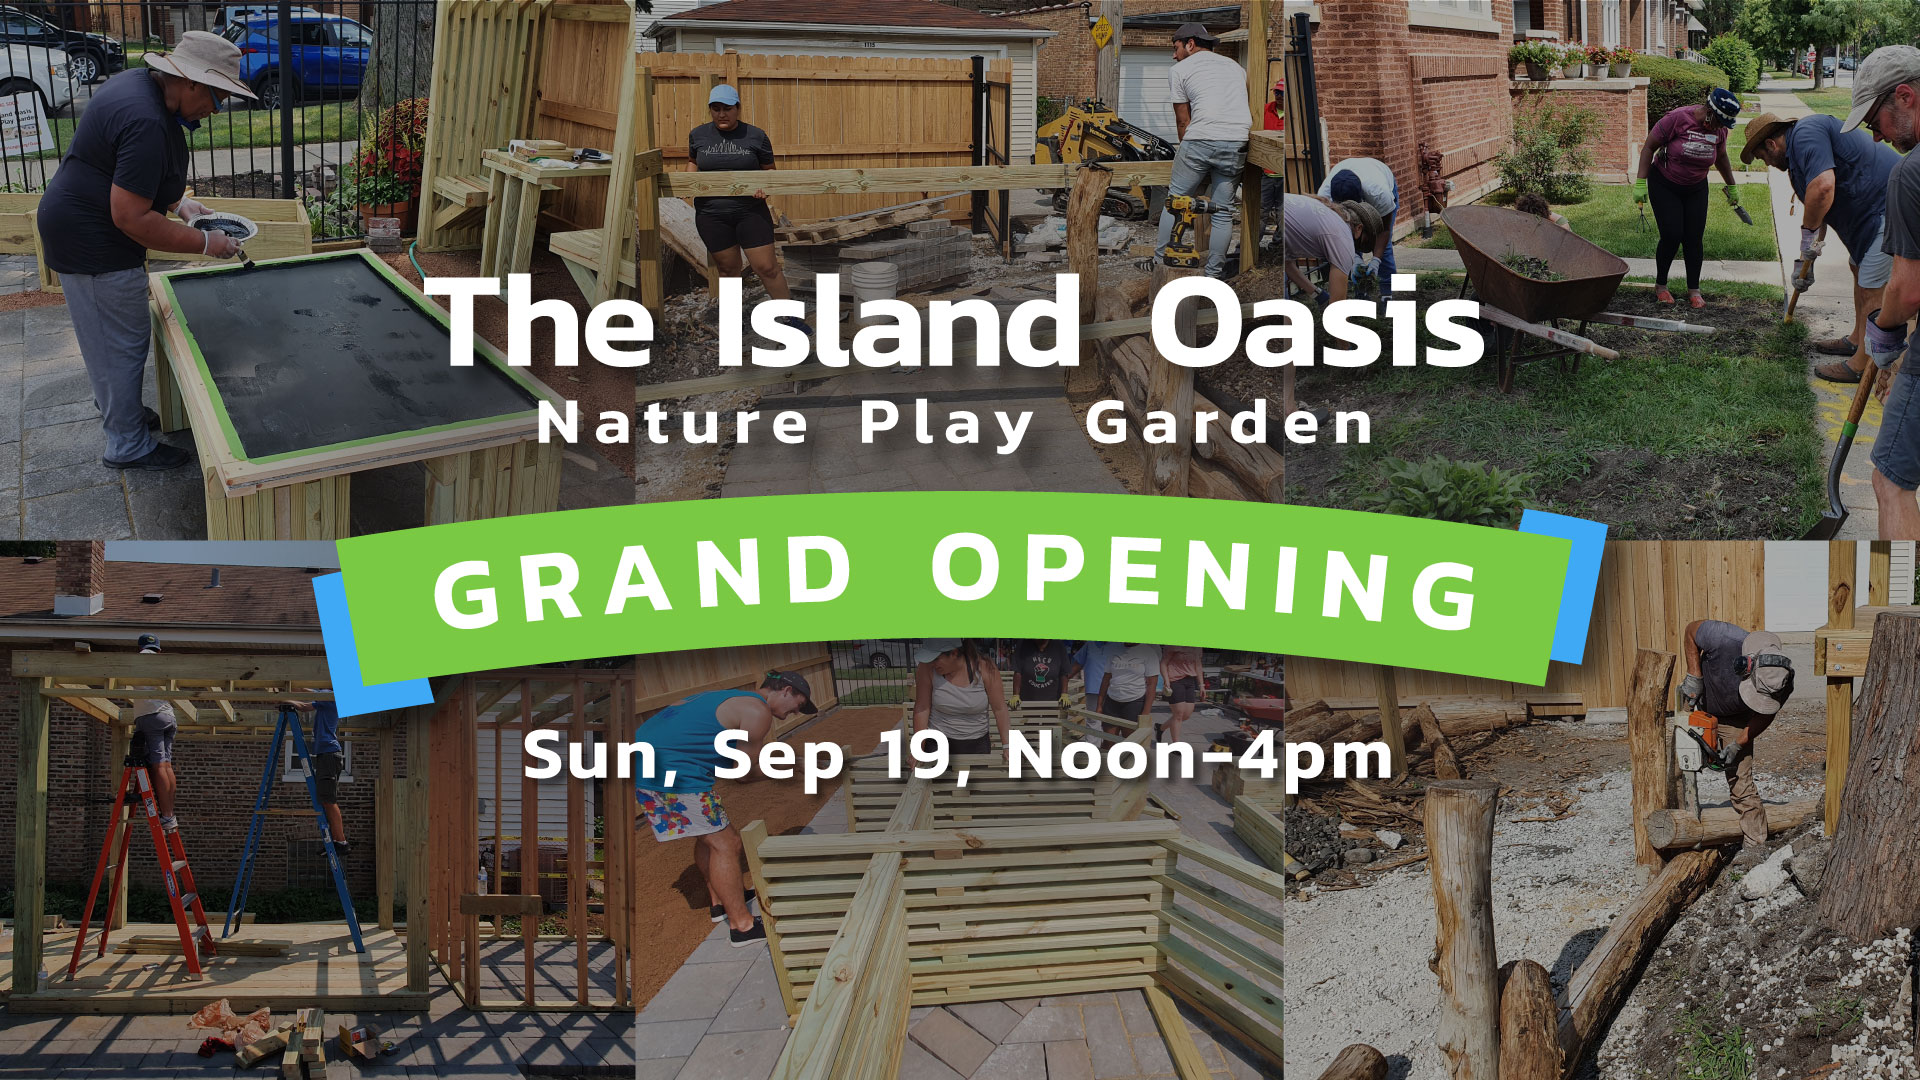 The Island Oasis Nature Play Garden Austin Chicago